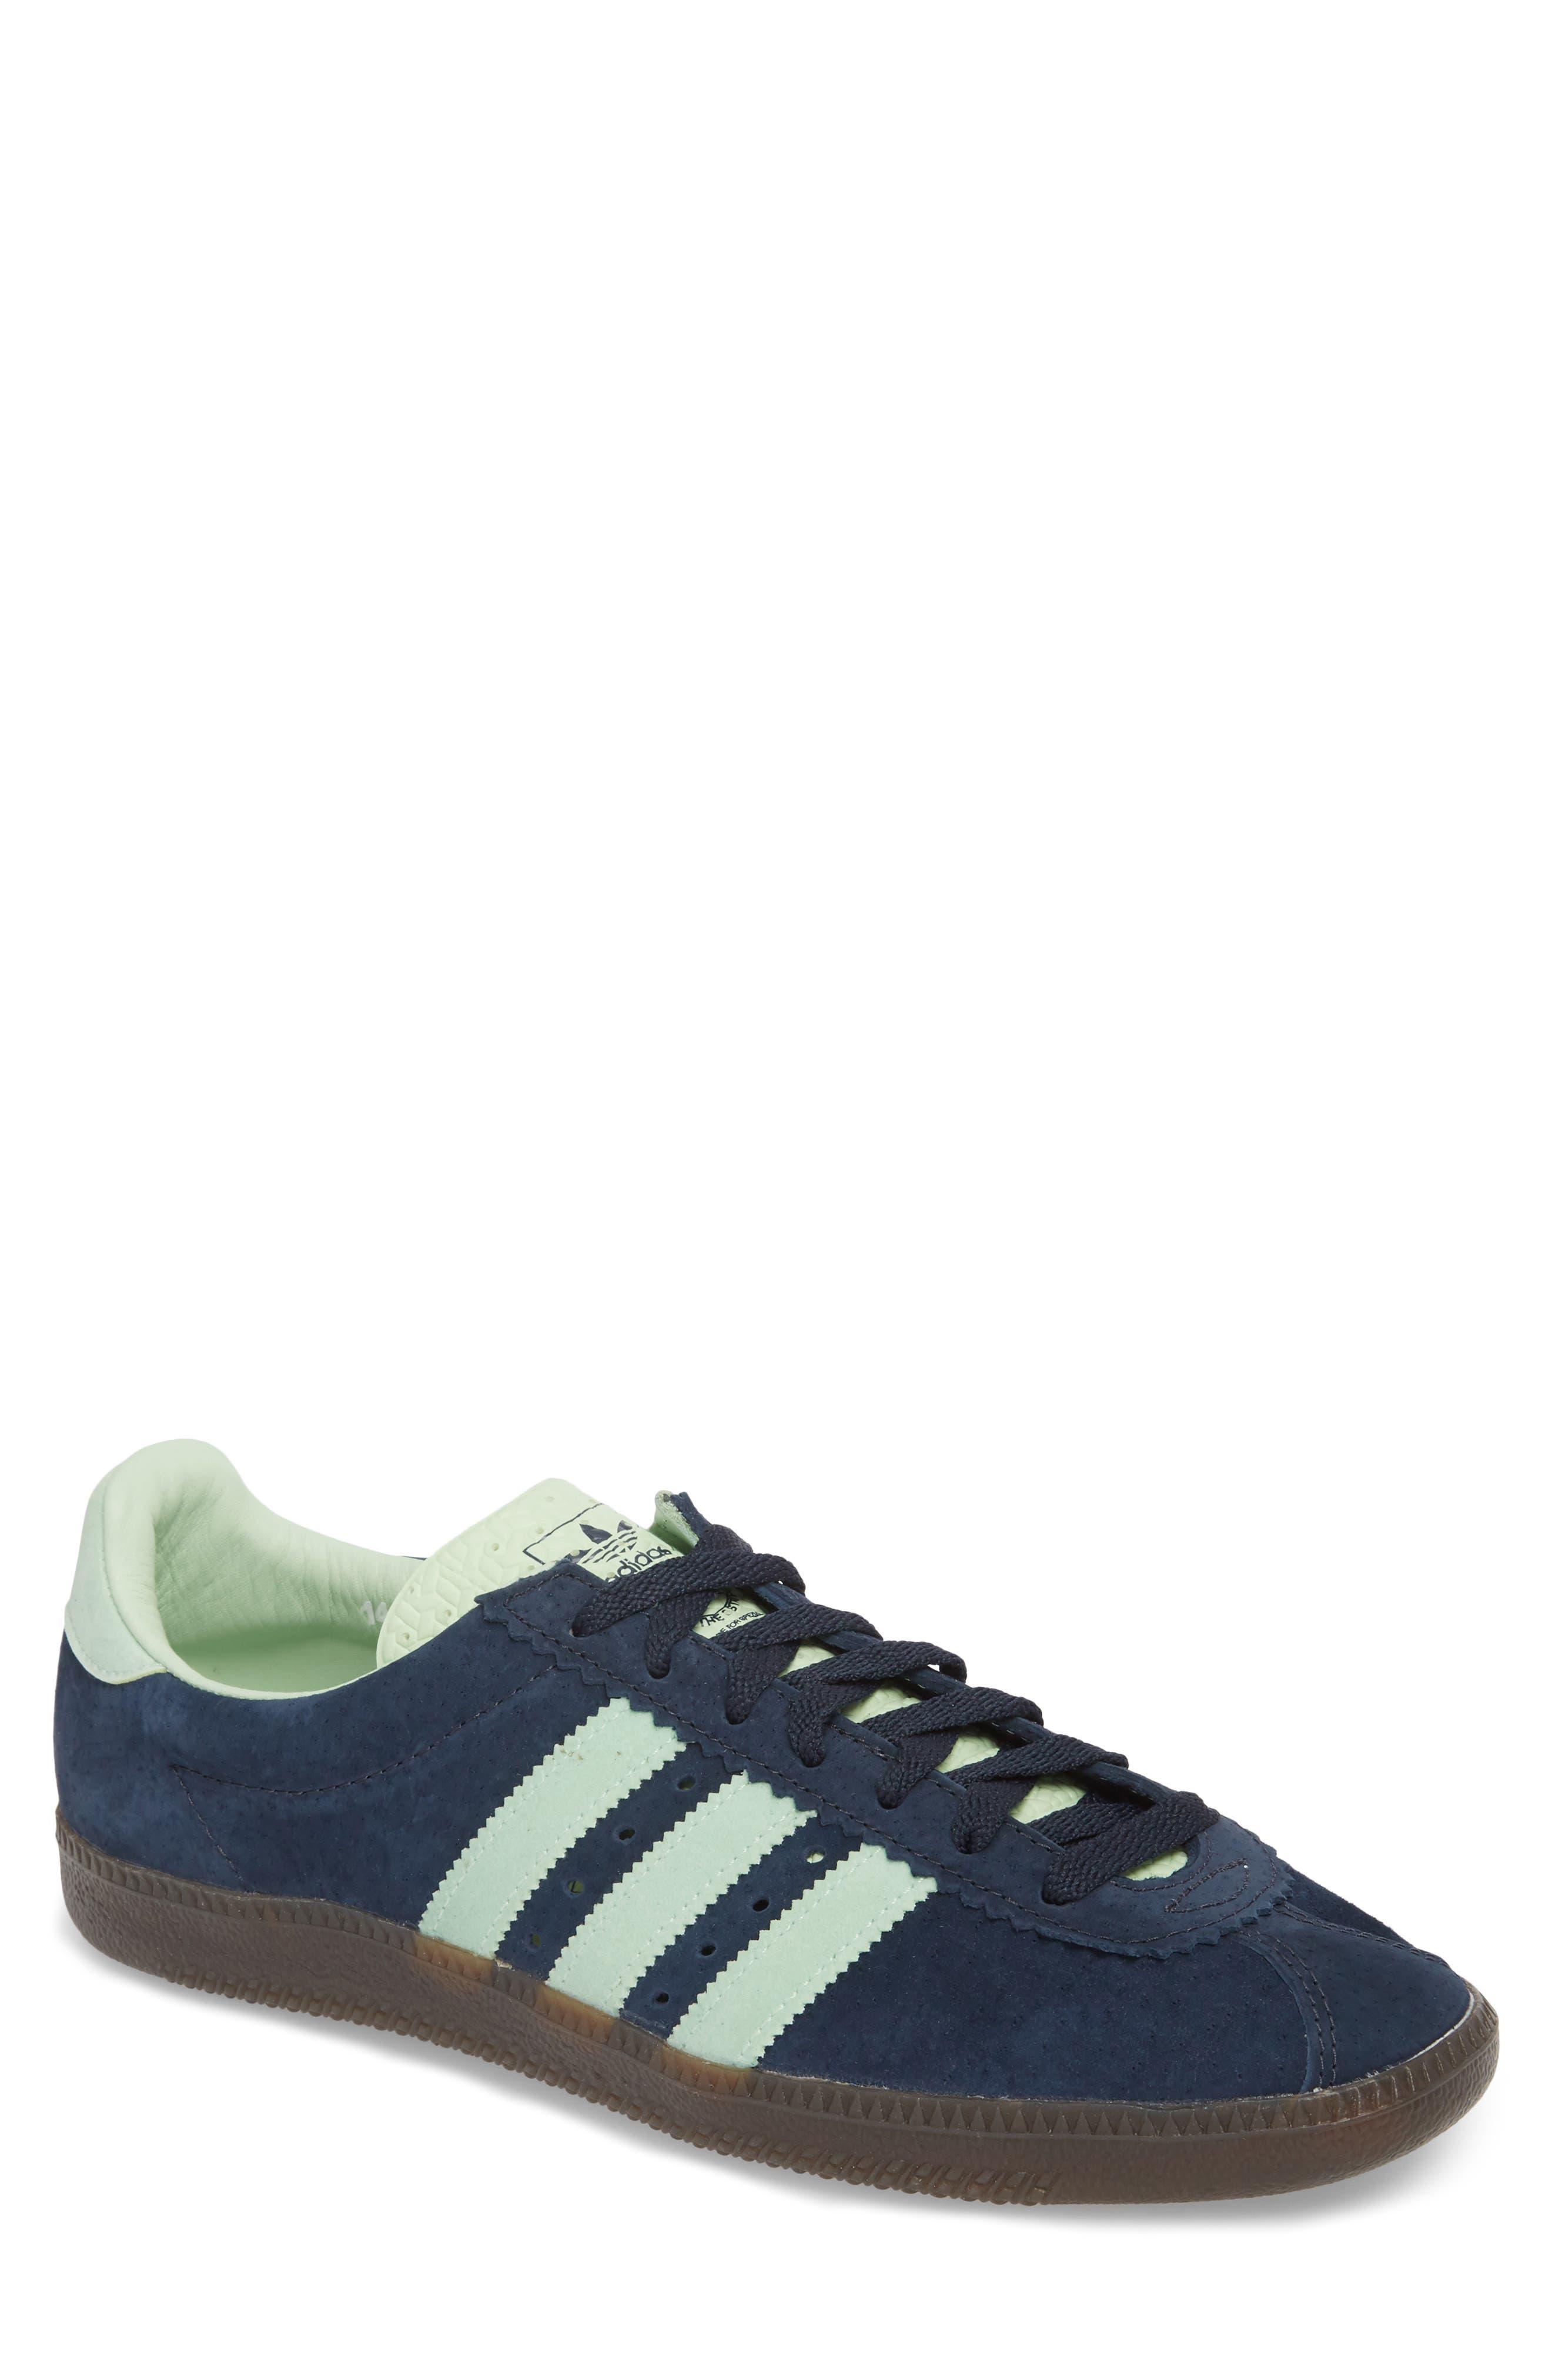 Padiham SPZL Sneaker,                         Main,                         color, NIGHT NAVY